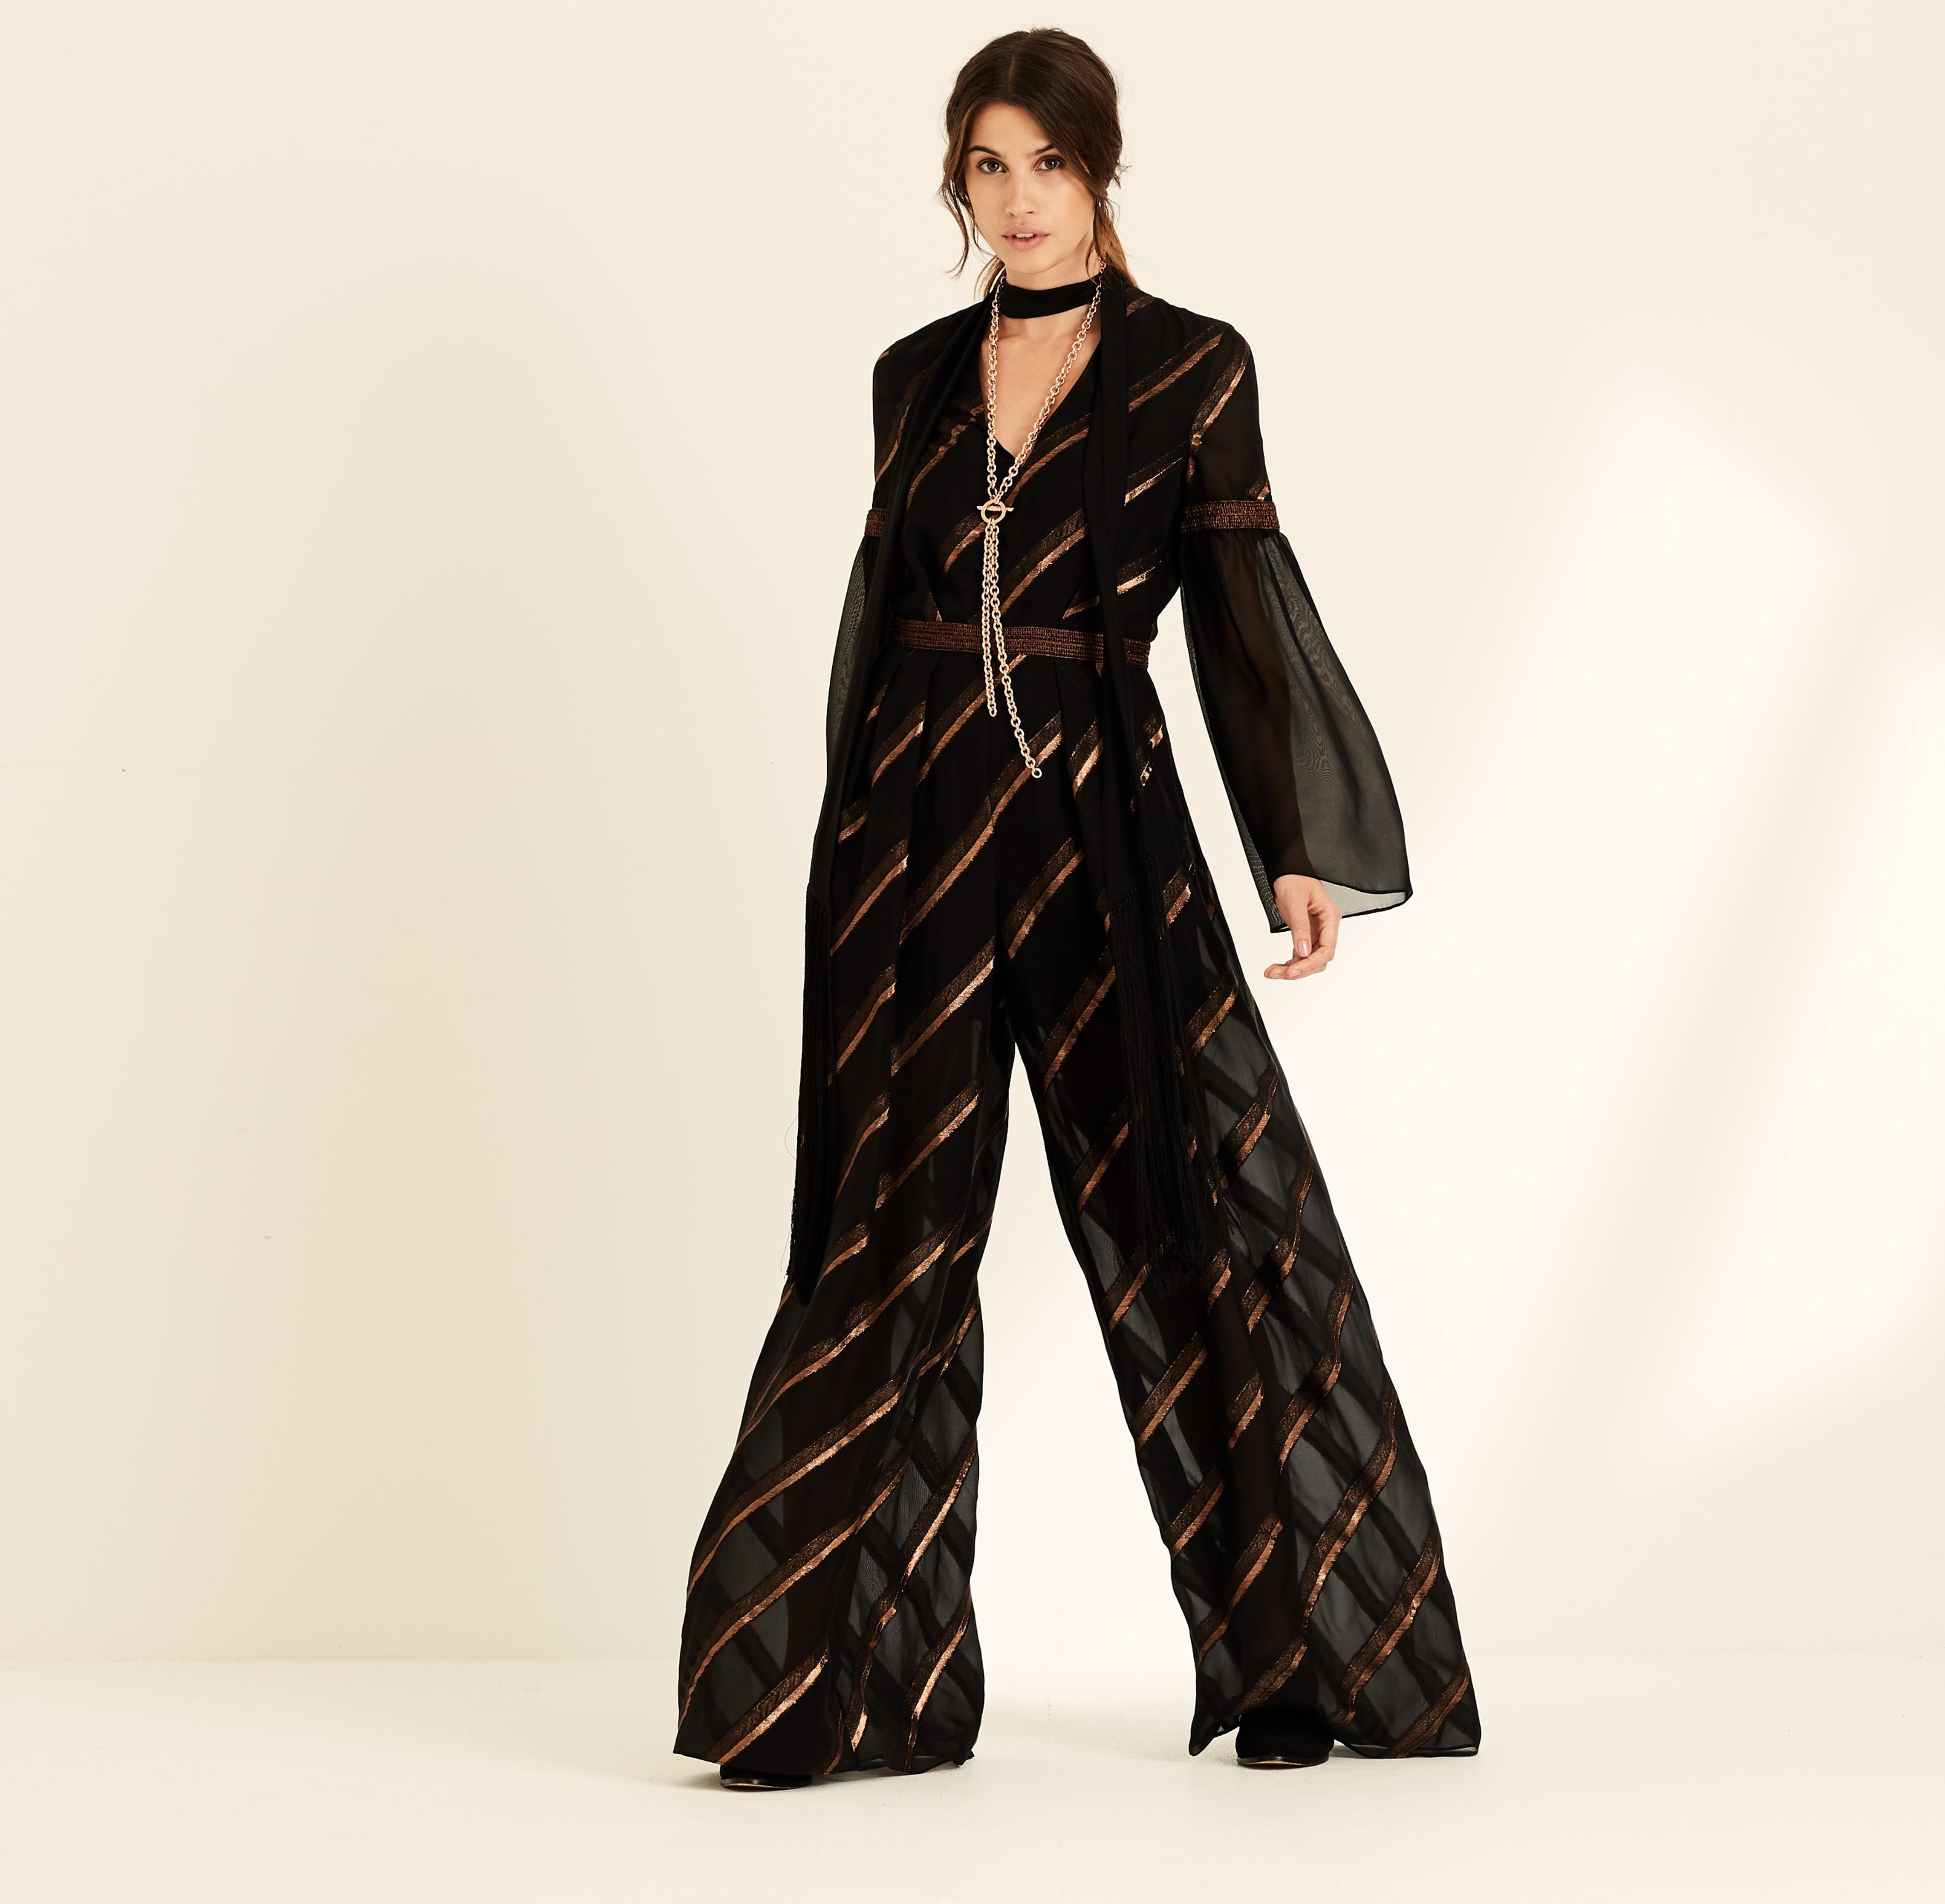 ac2f7dc2d9de Amanda Wakeley Black Metallic Chiffon Stripe Jumpsuit in Black ...